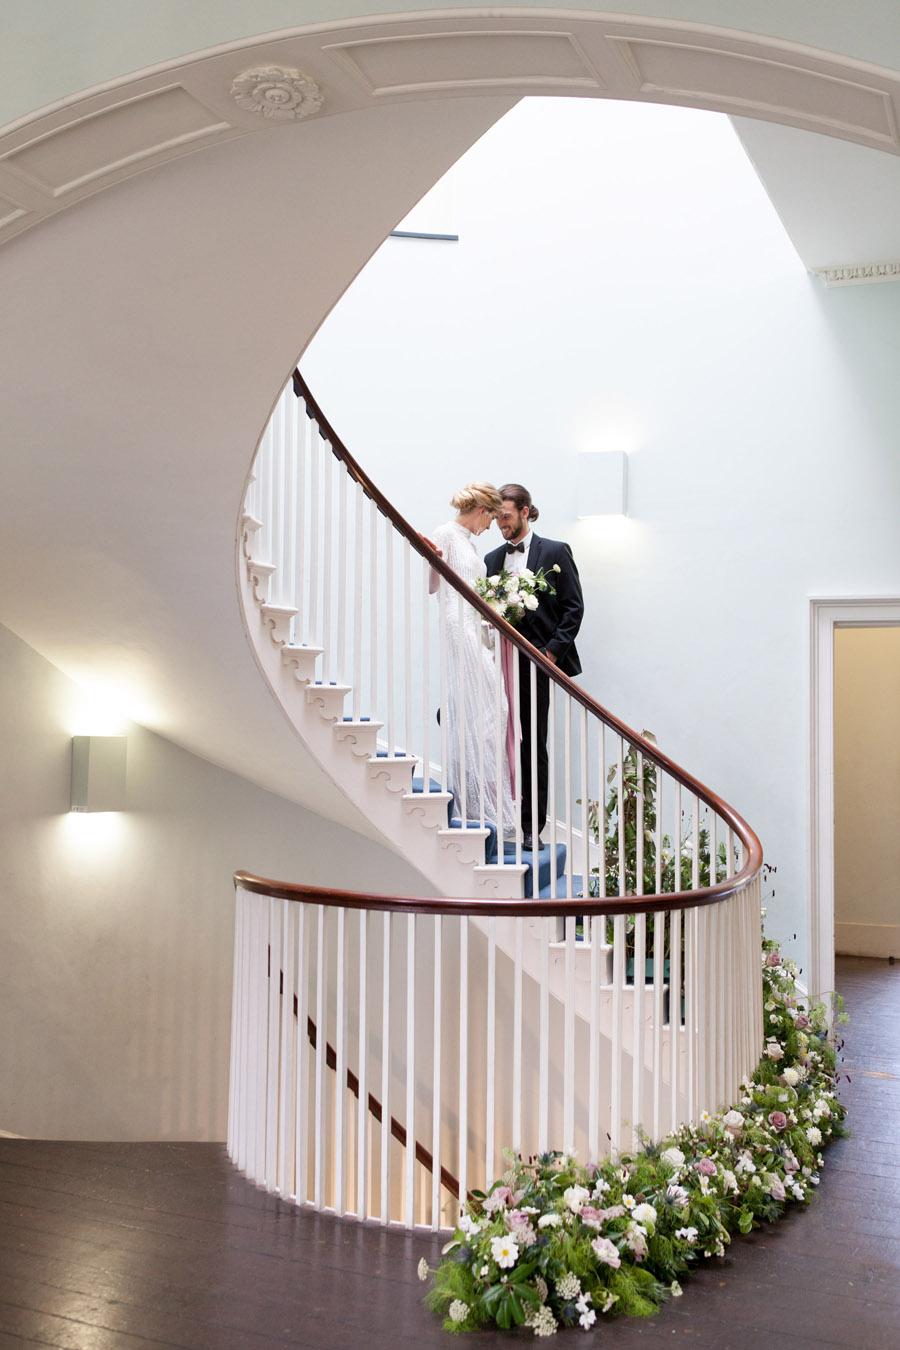 Amanda-Karen-Photography-Transition-of-Seasons-London-Wedding-Styled-Shoot-English-Wedding-Blog-203.jpg